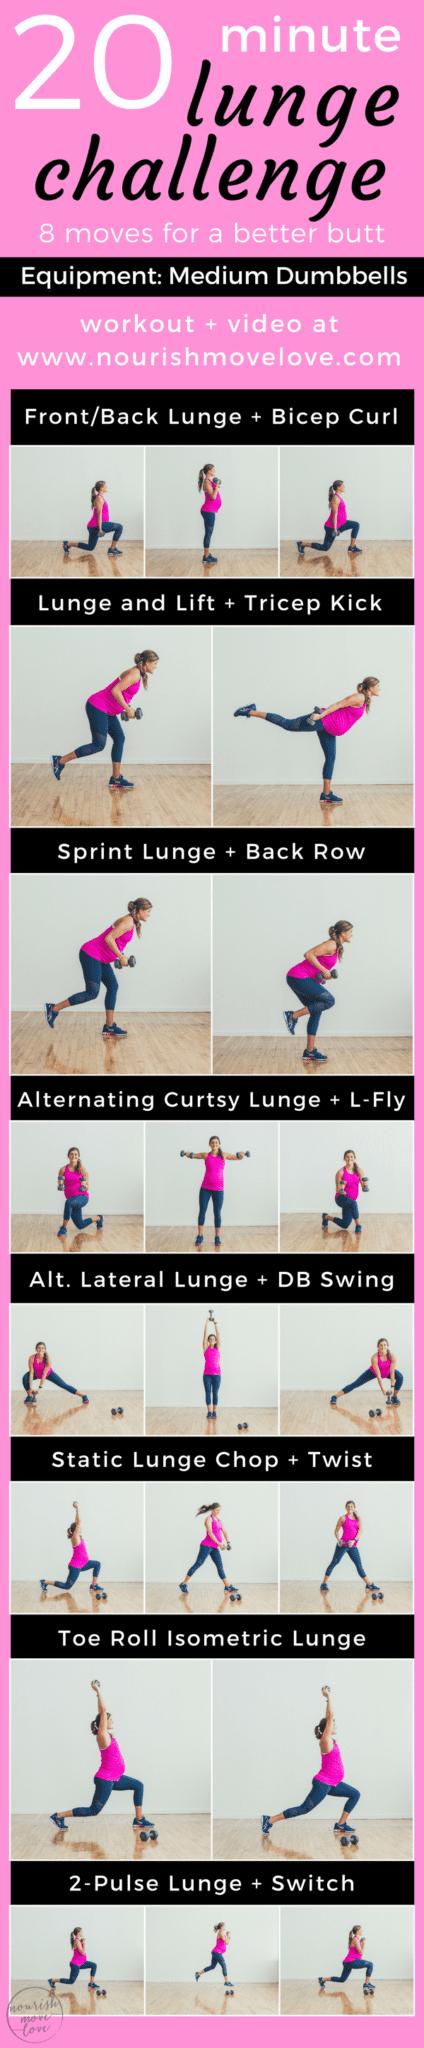 20 minute lunge challenge for a better butt | www.nourishmovelove.com